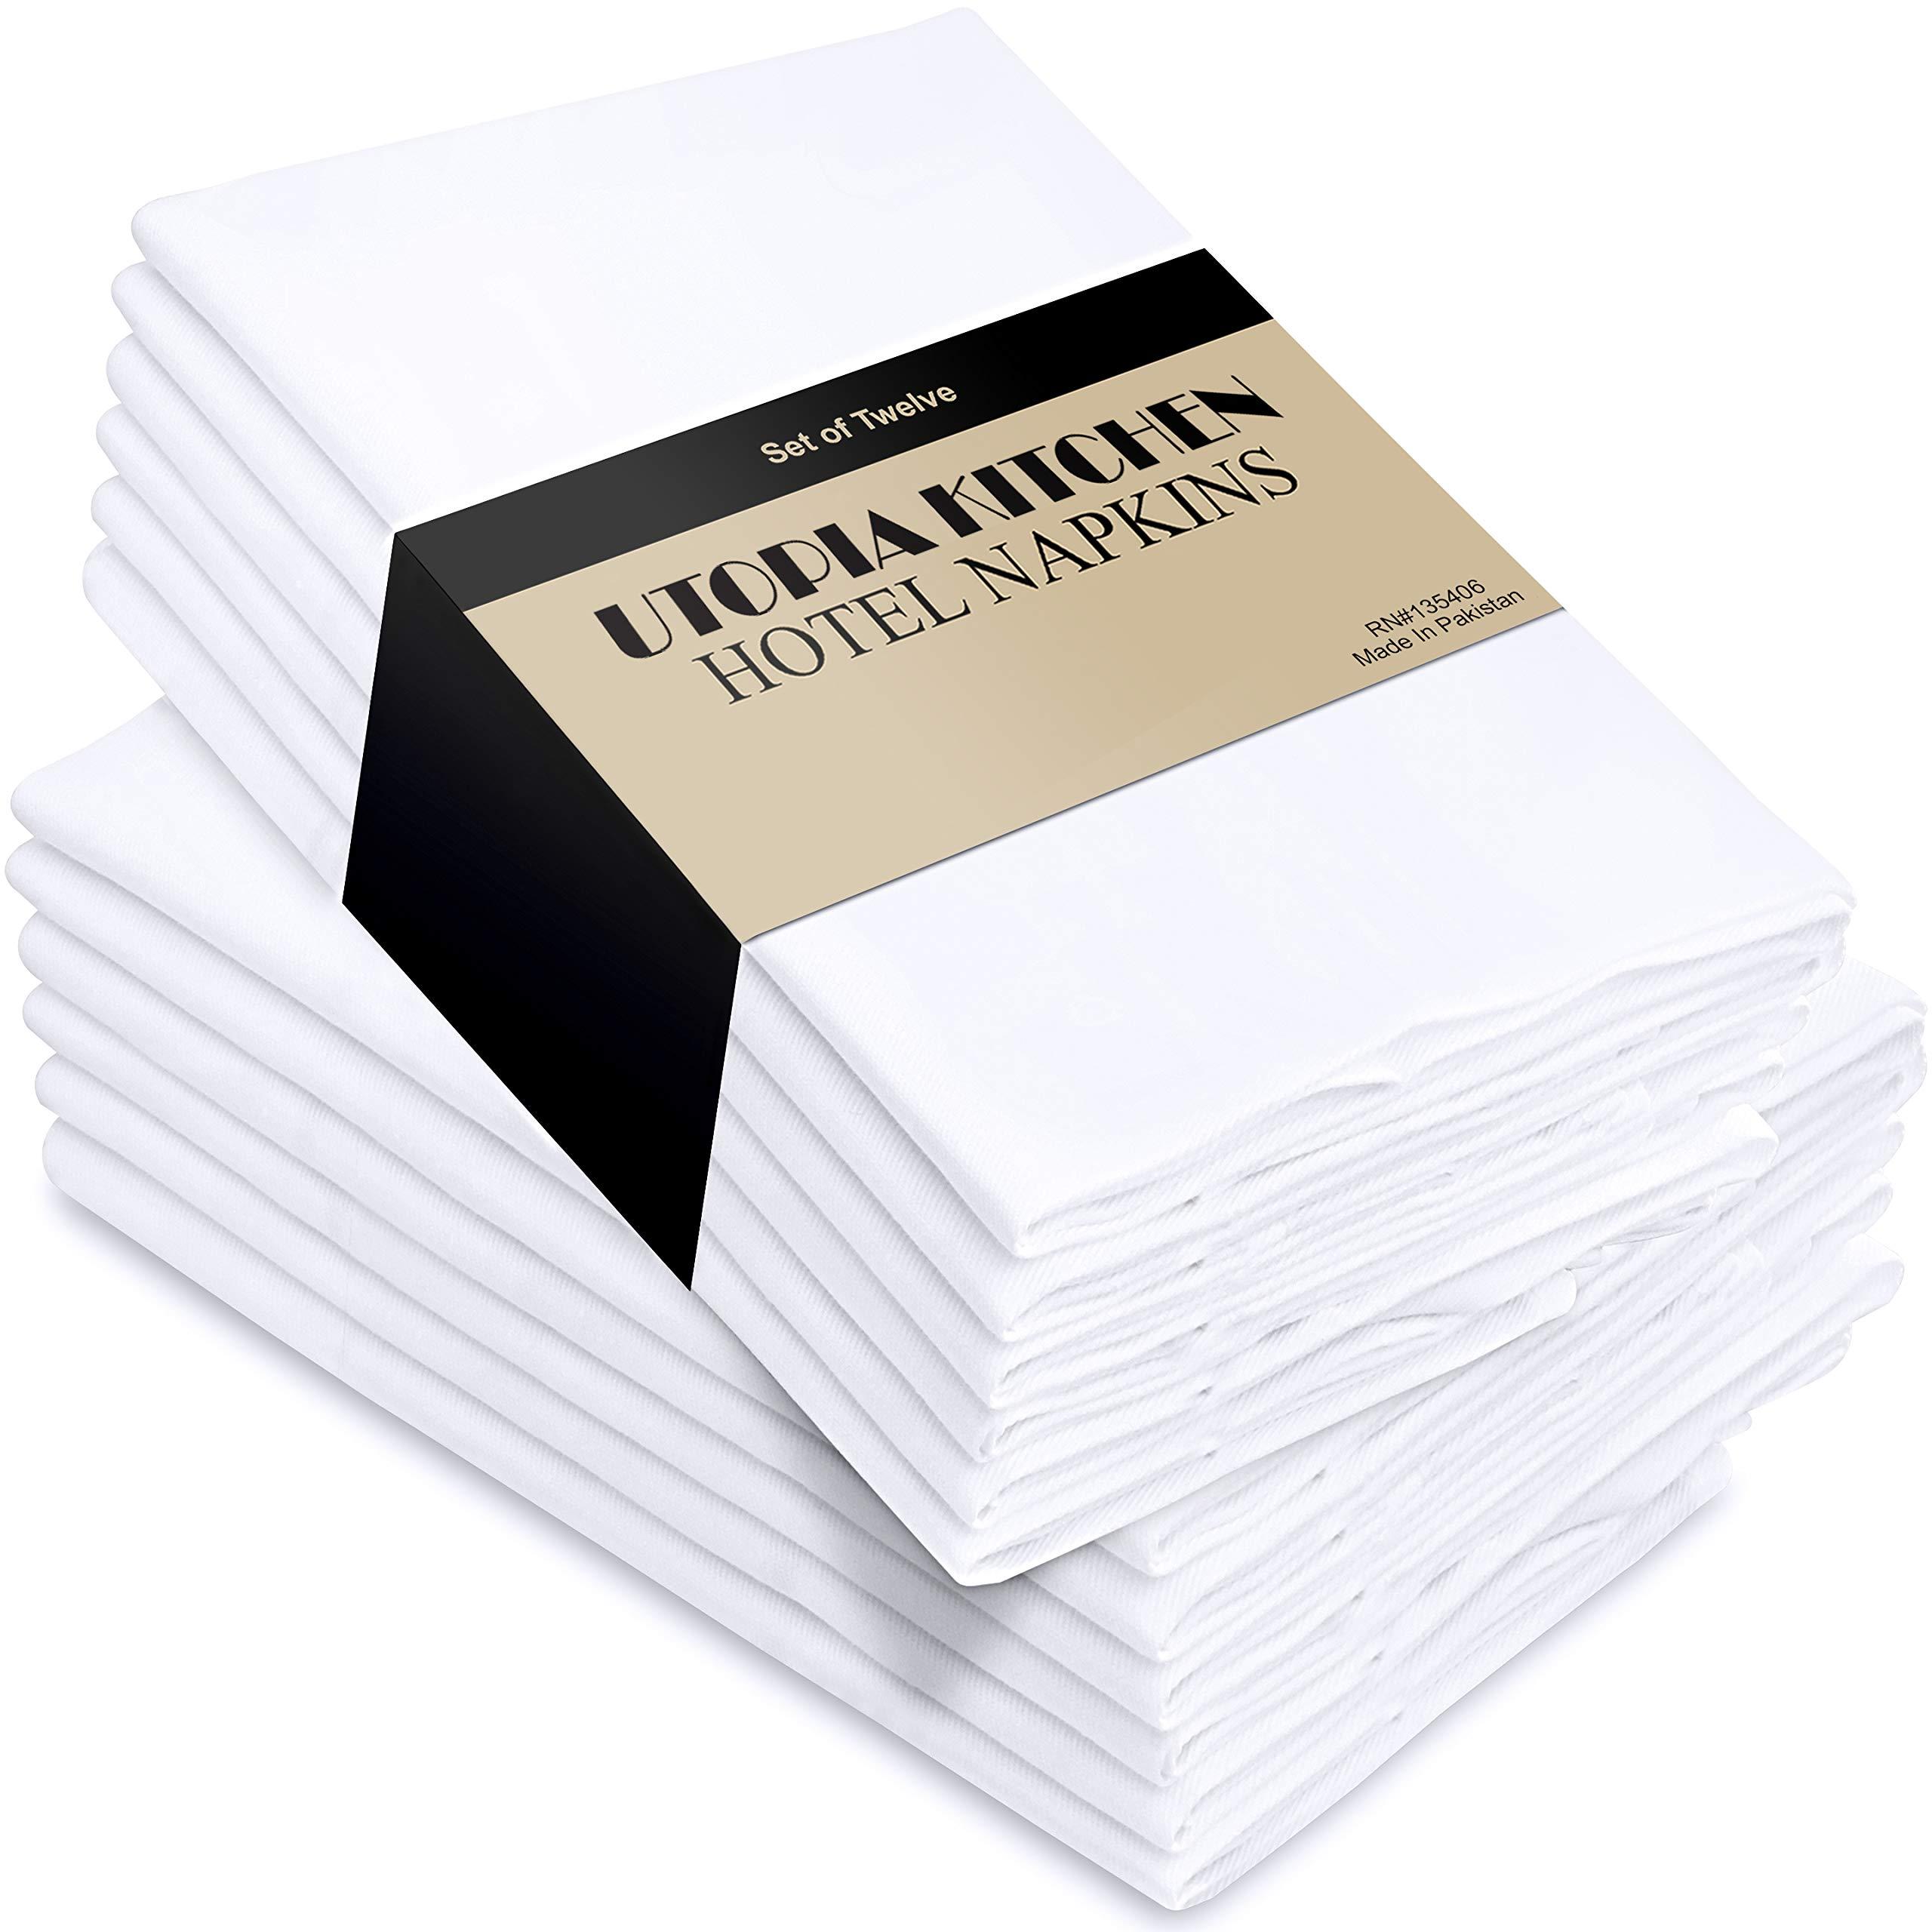 20 Napkins Unicolor White-White Monochrome Party Neutral Uni Color 33x33cm